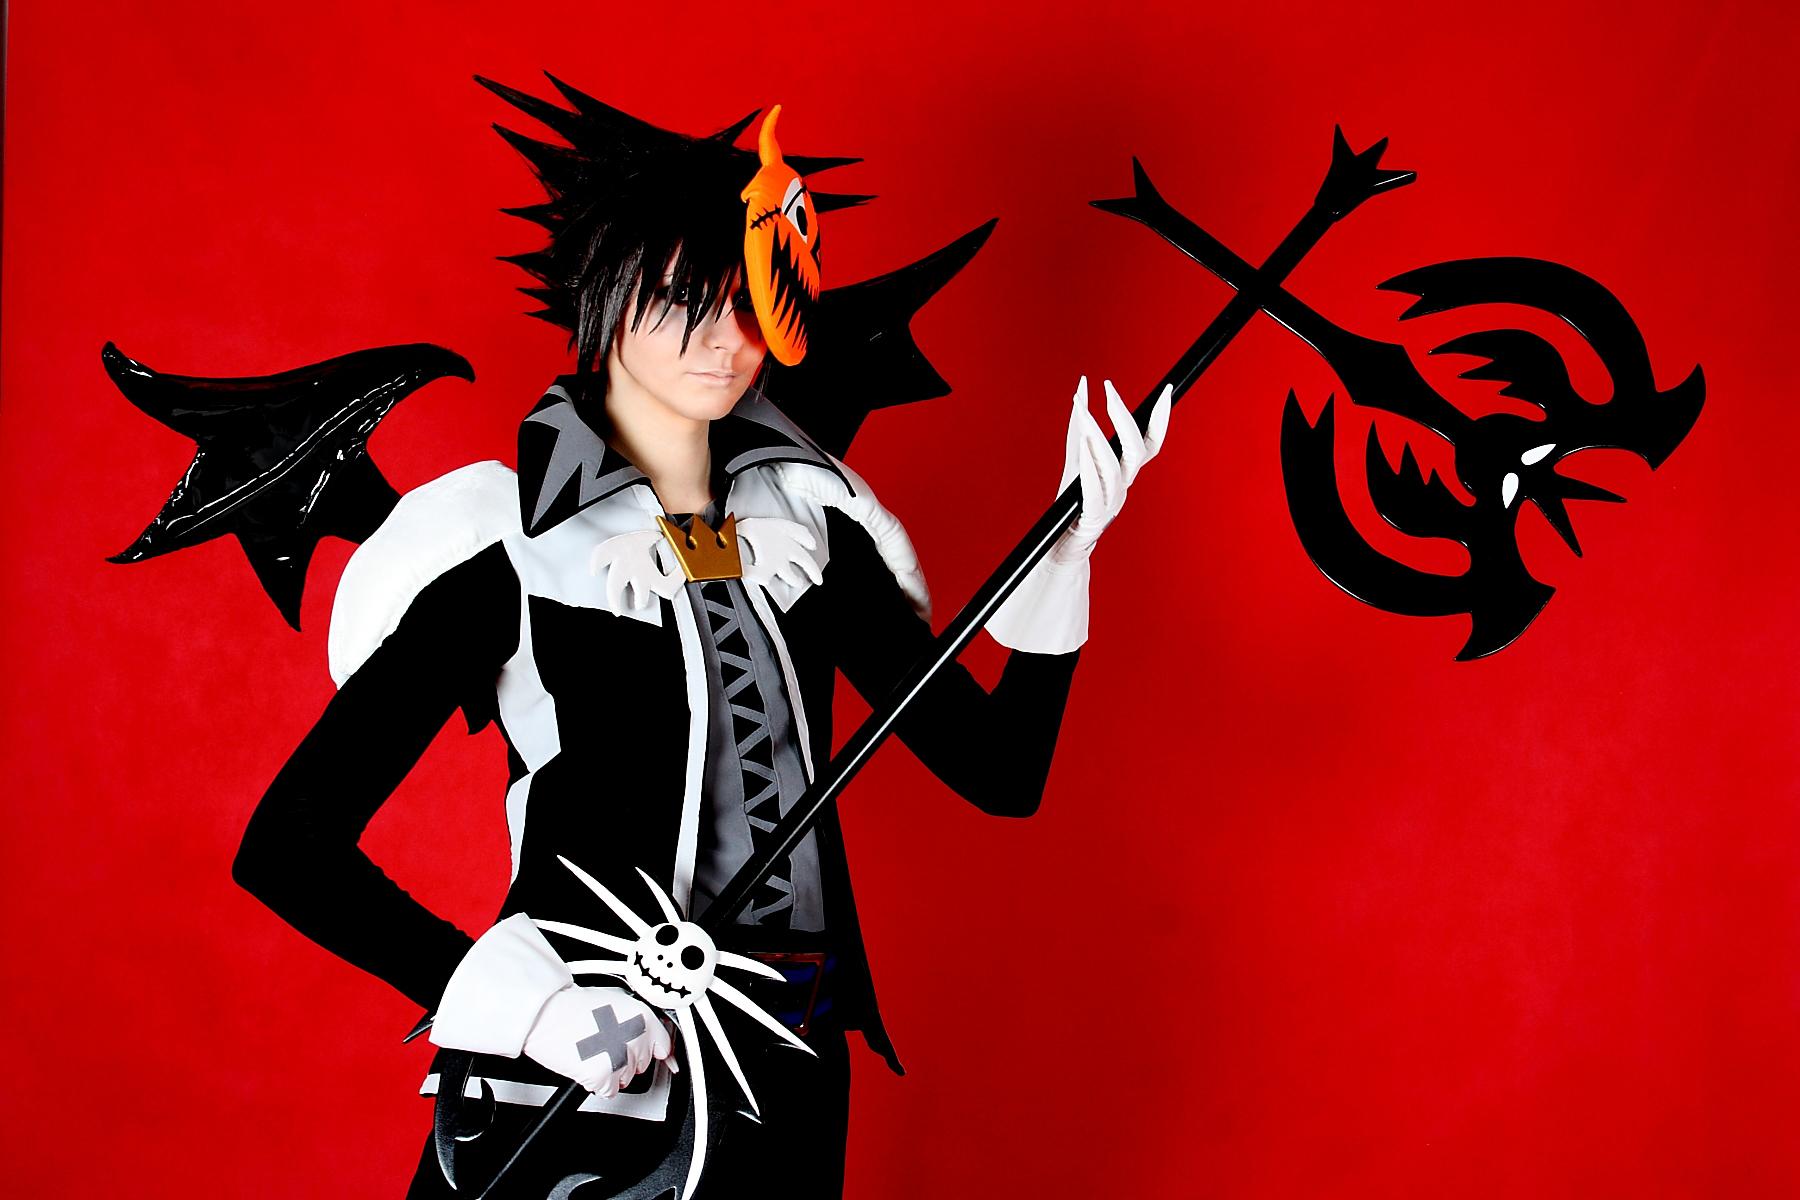 Sora Halloween Town 05 cosplay by 696Axel696 on DeviantArt